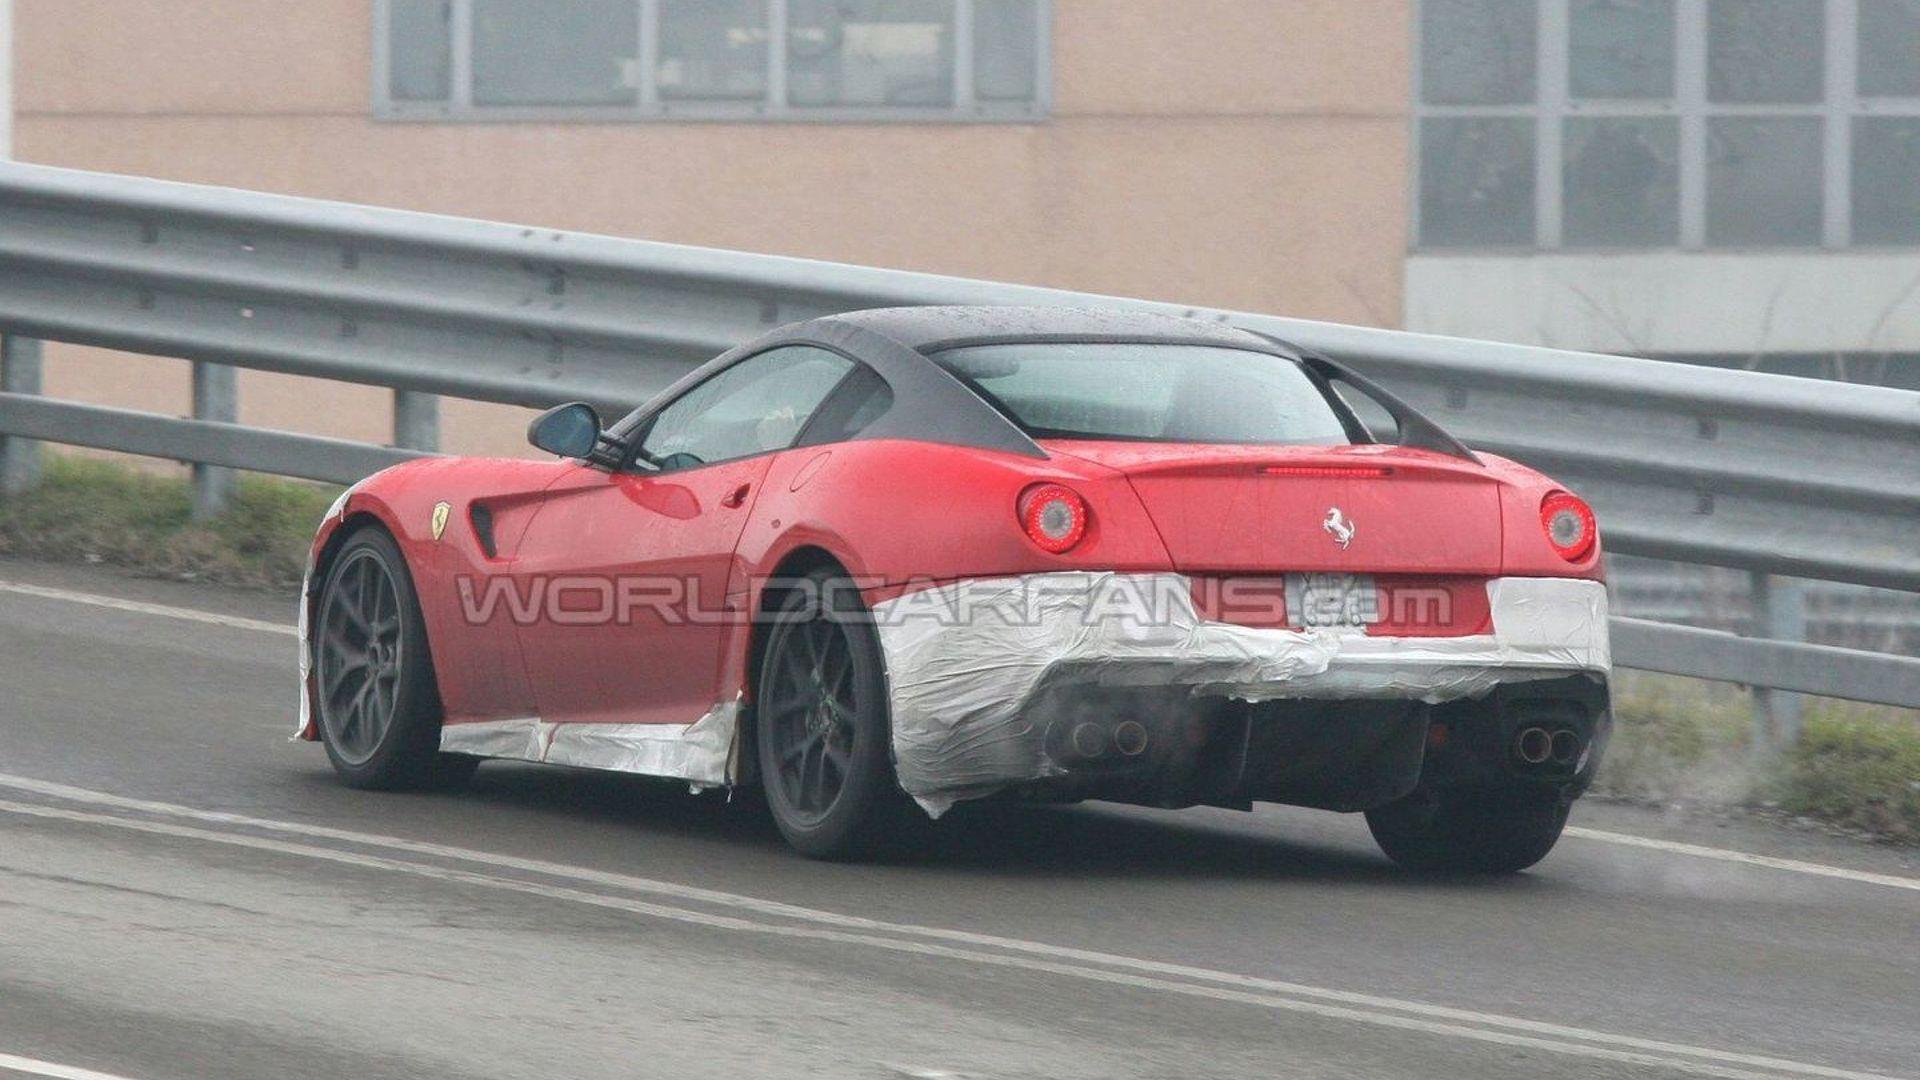 Alleged Ferrari 599 GTO Photos Look Sketchy [Video]